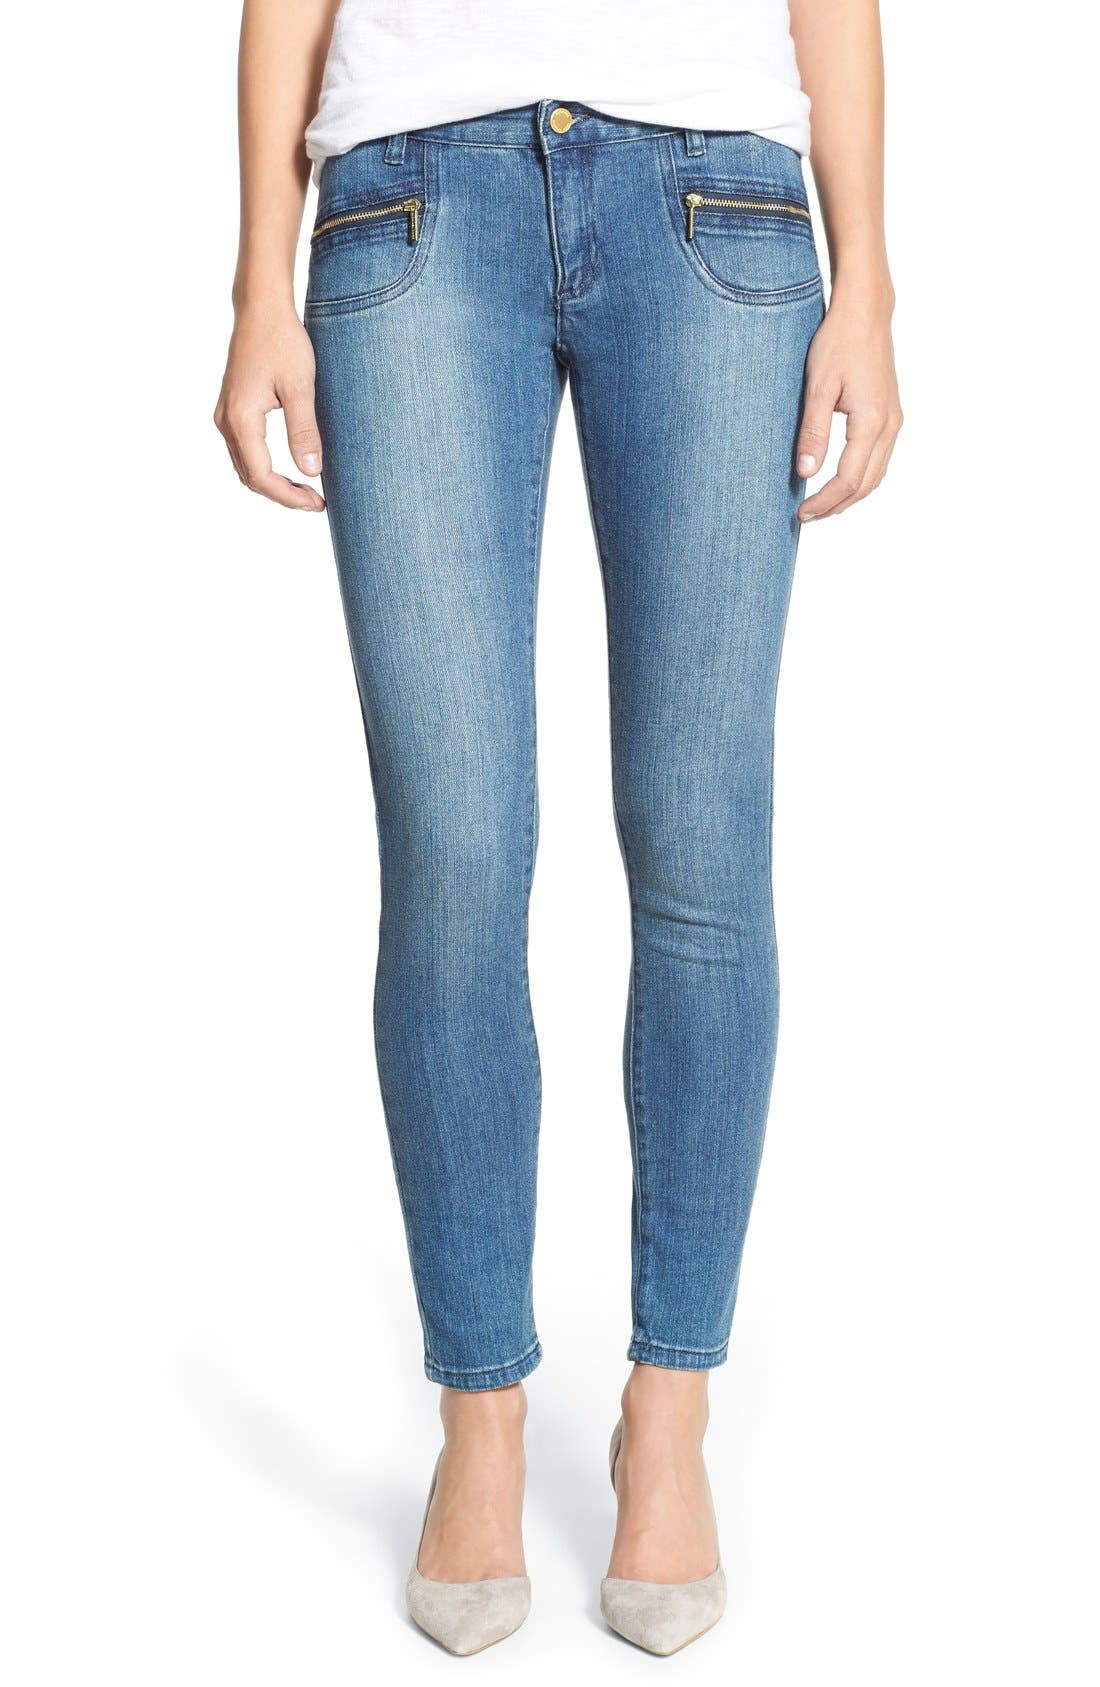 Main Image - MICHAEL Michael KorsStretch Zip Pocket Ankle Skinny Jeans(Veruschka)